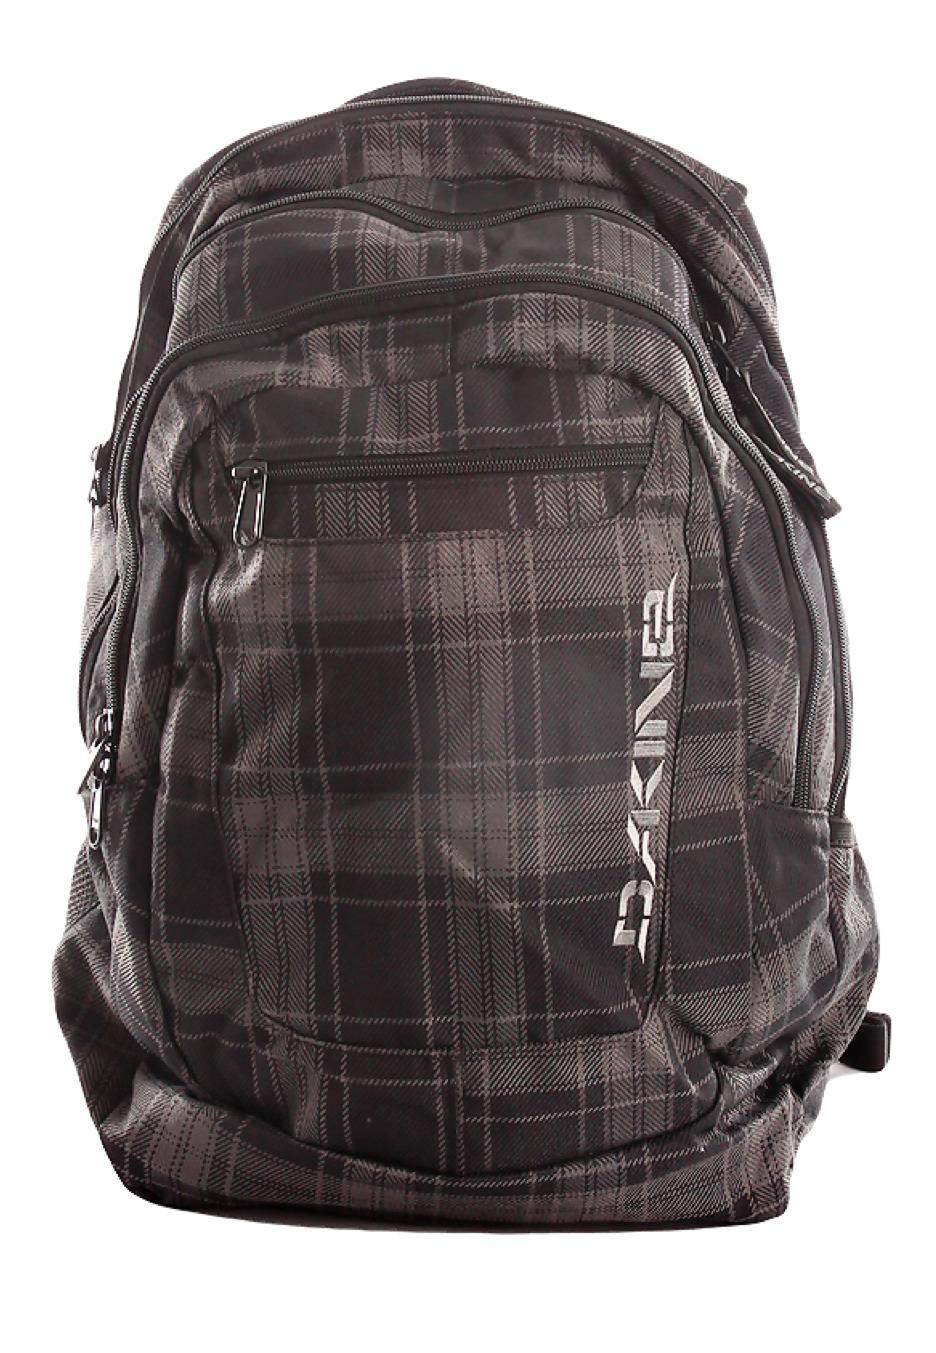 Dakine - Element Pack Northwood - Backpack - Impericon.com Worldwide